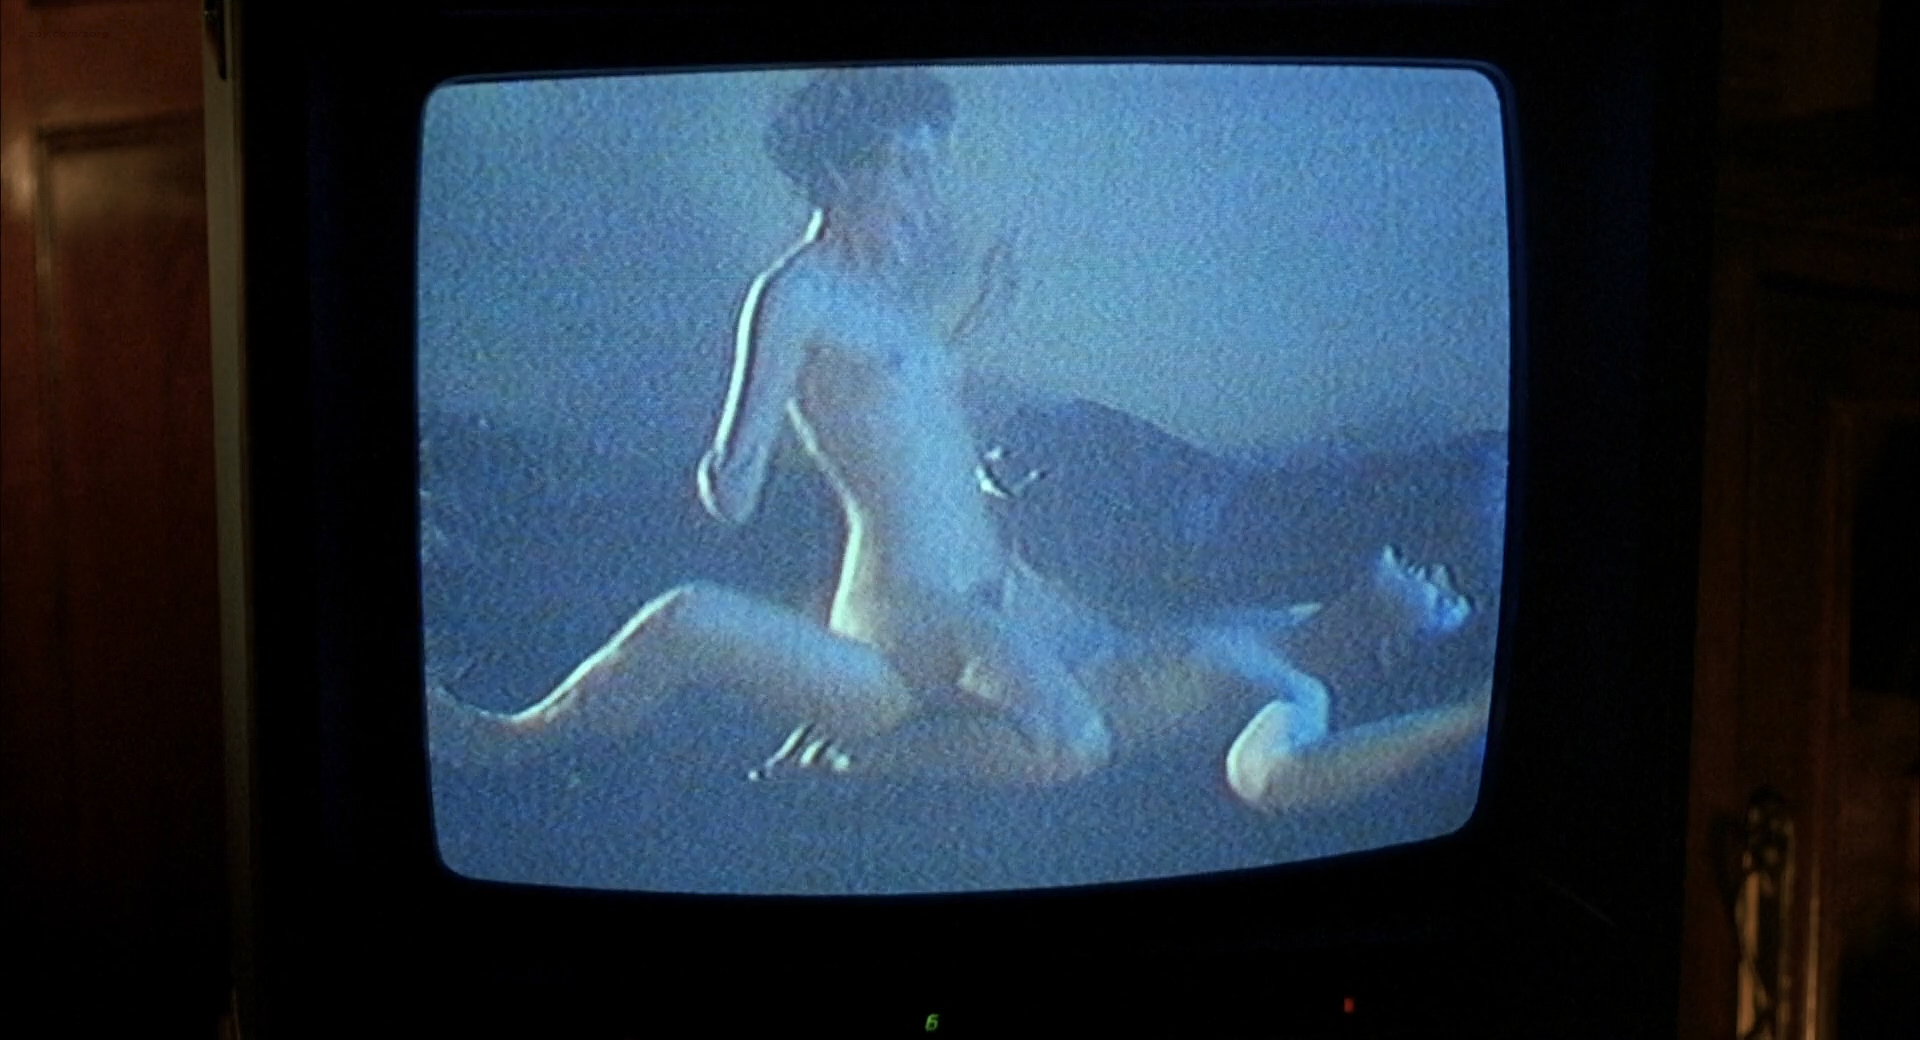 Lisa Zane nude sex Adrienne Leigh and Charisse Glenn nude sex threesome - Bad Influence (1990) HD 1080p (5)